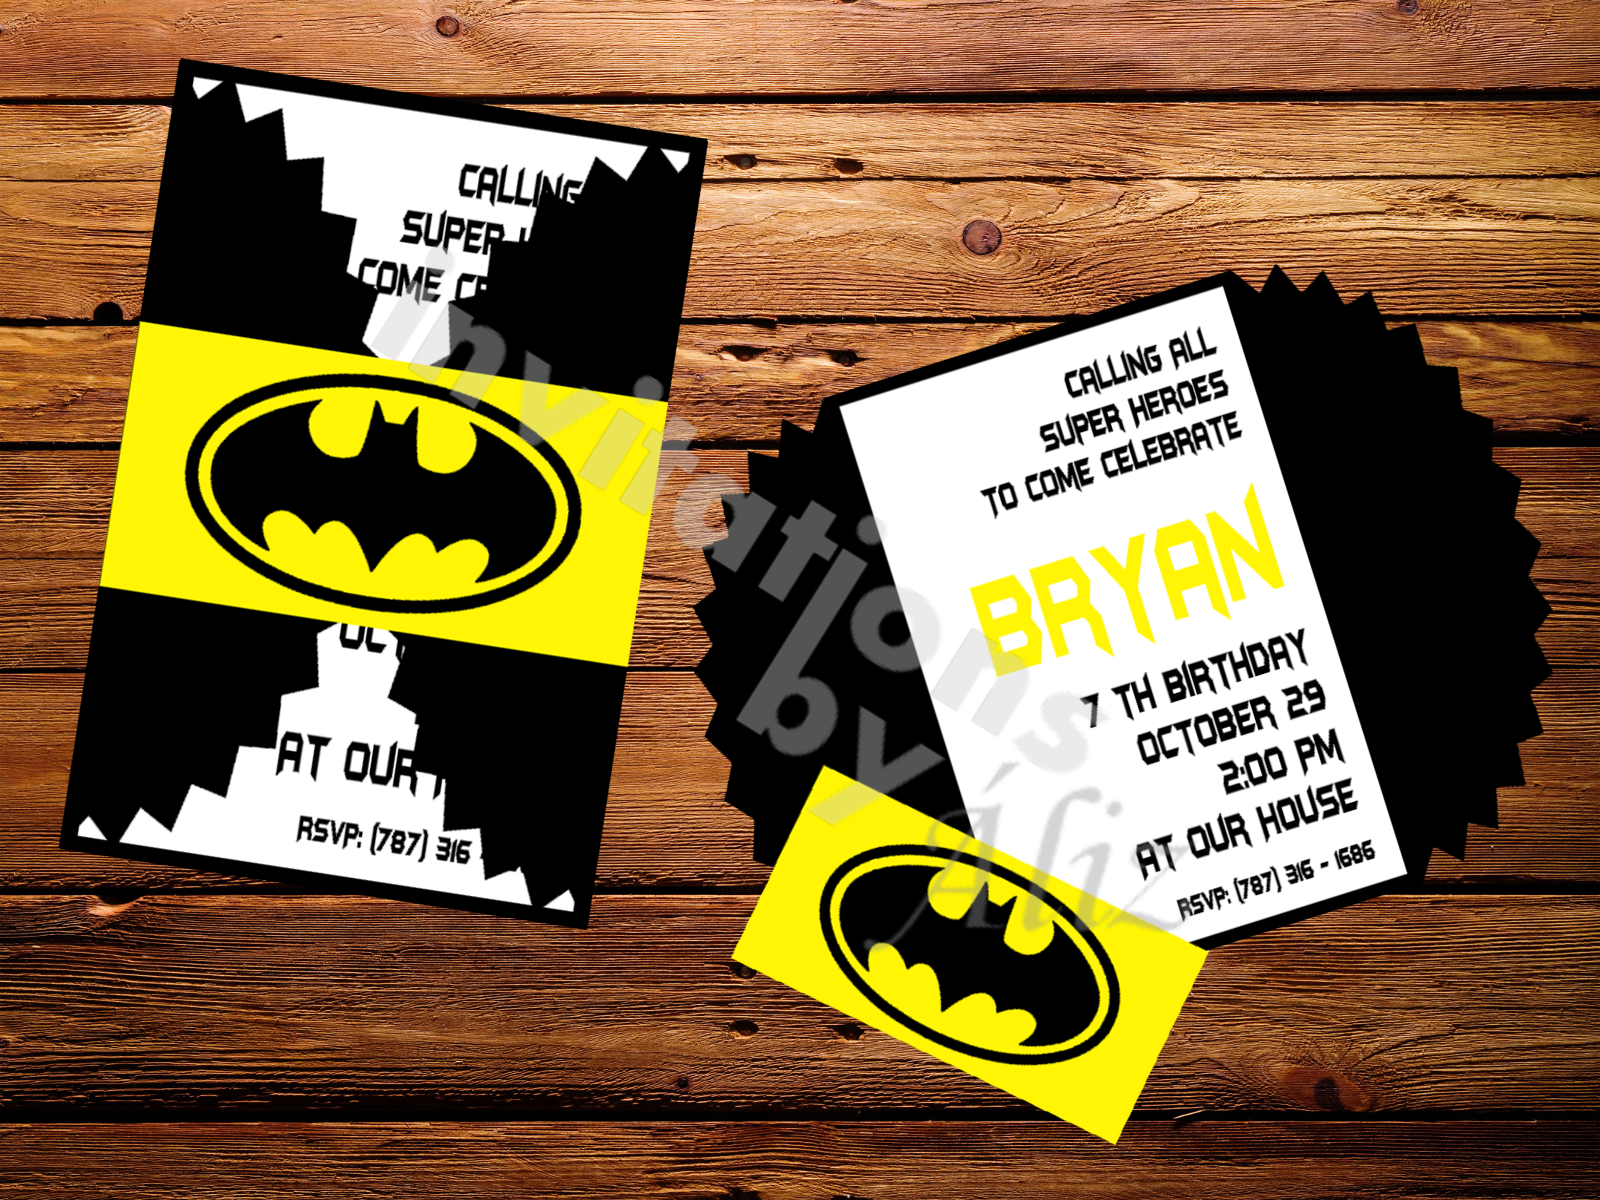 Batman Photo Invitations was amazing invitations layout